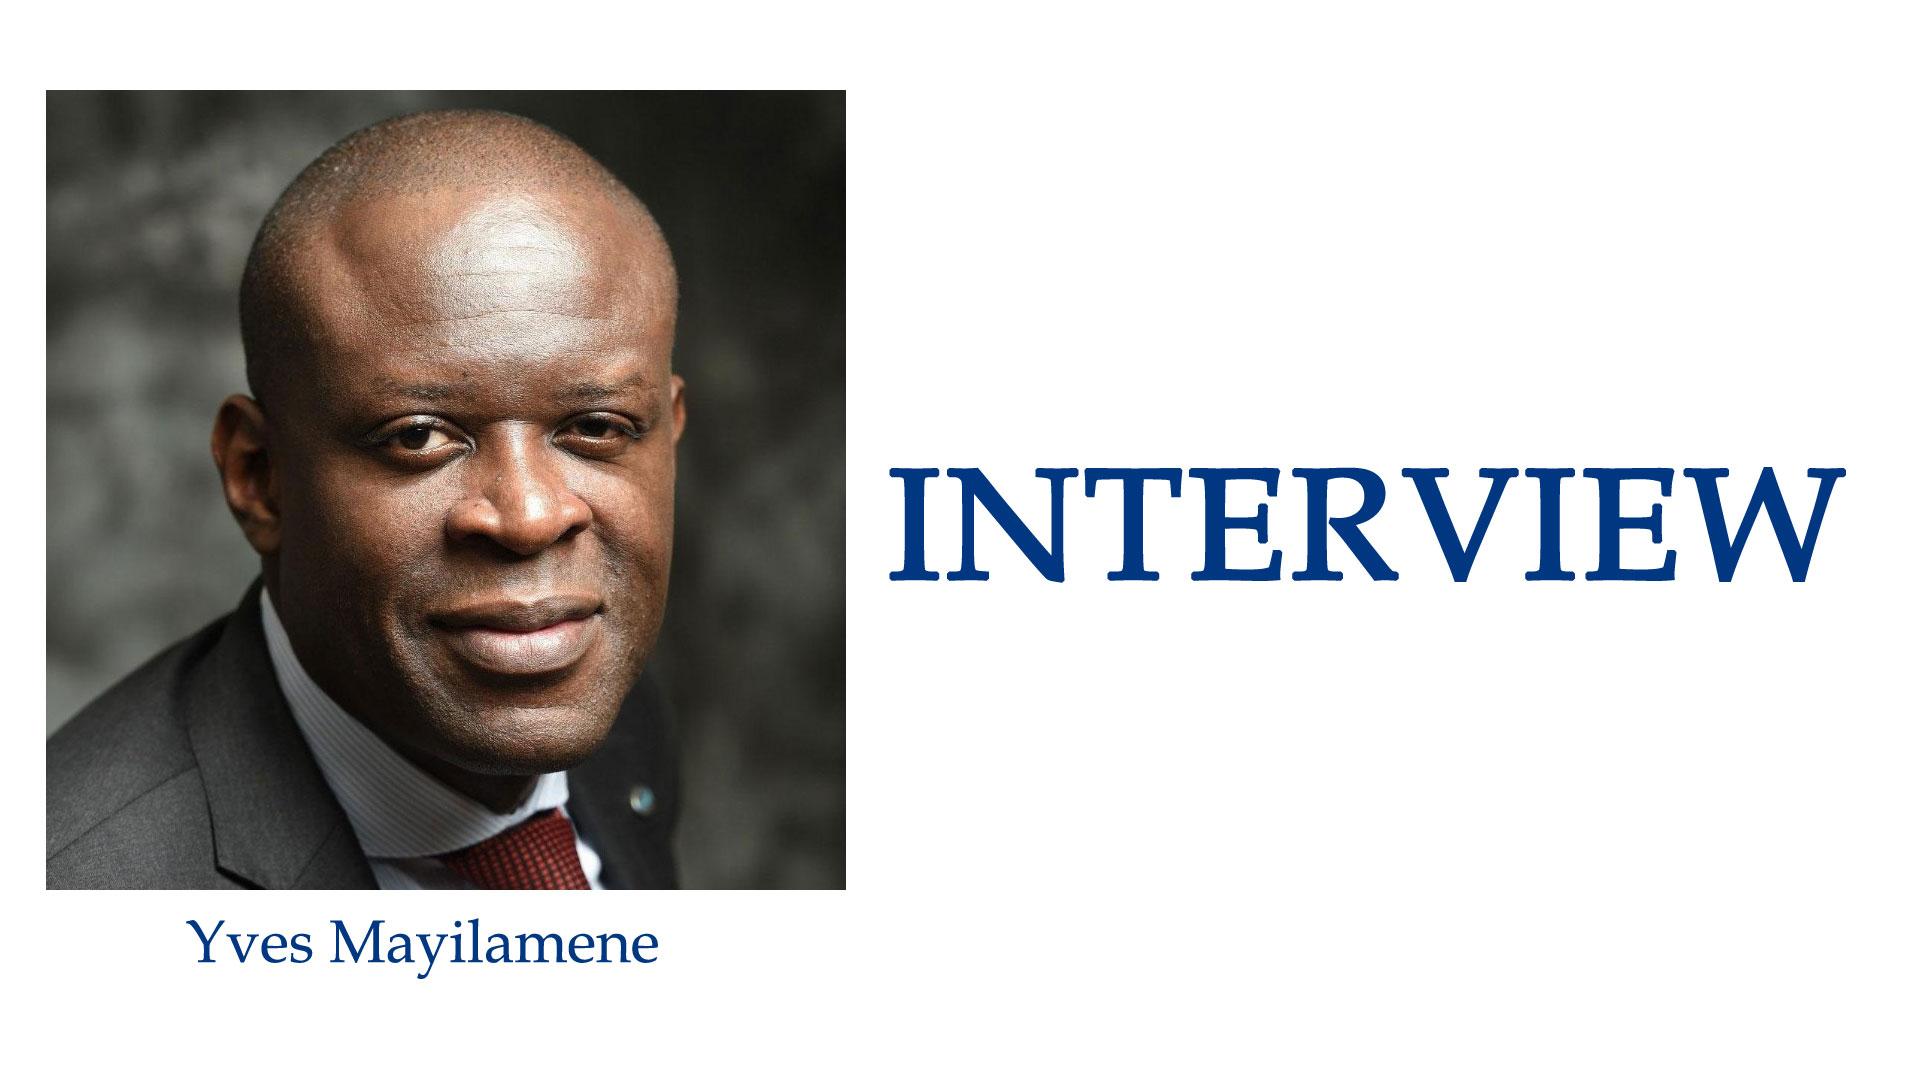 Yves Mayilamene DRH Ecobank